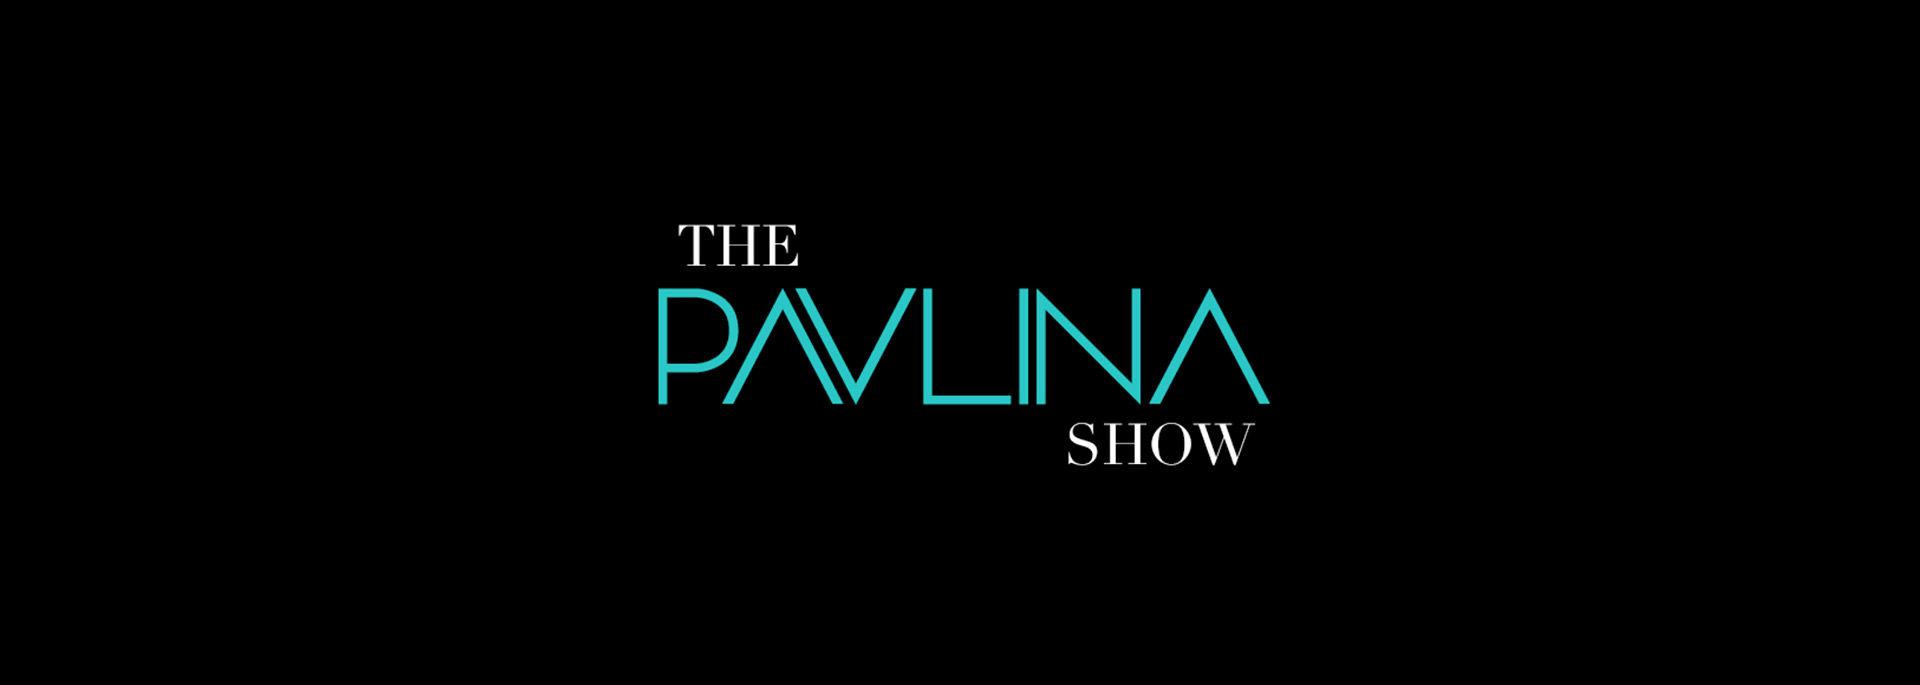 The PAVLINA Show